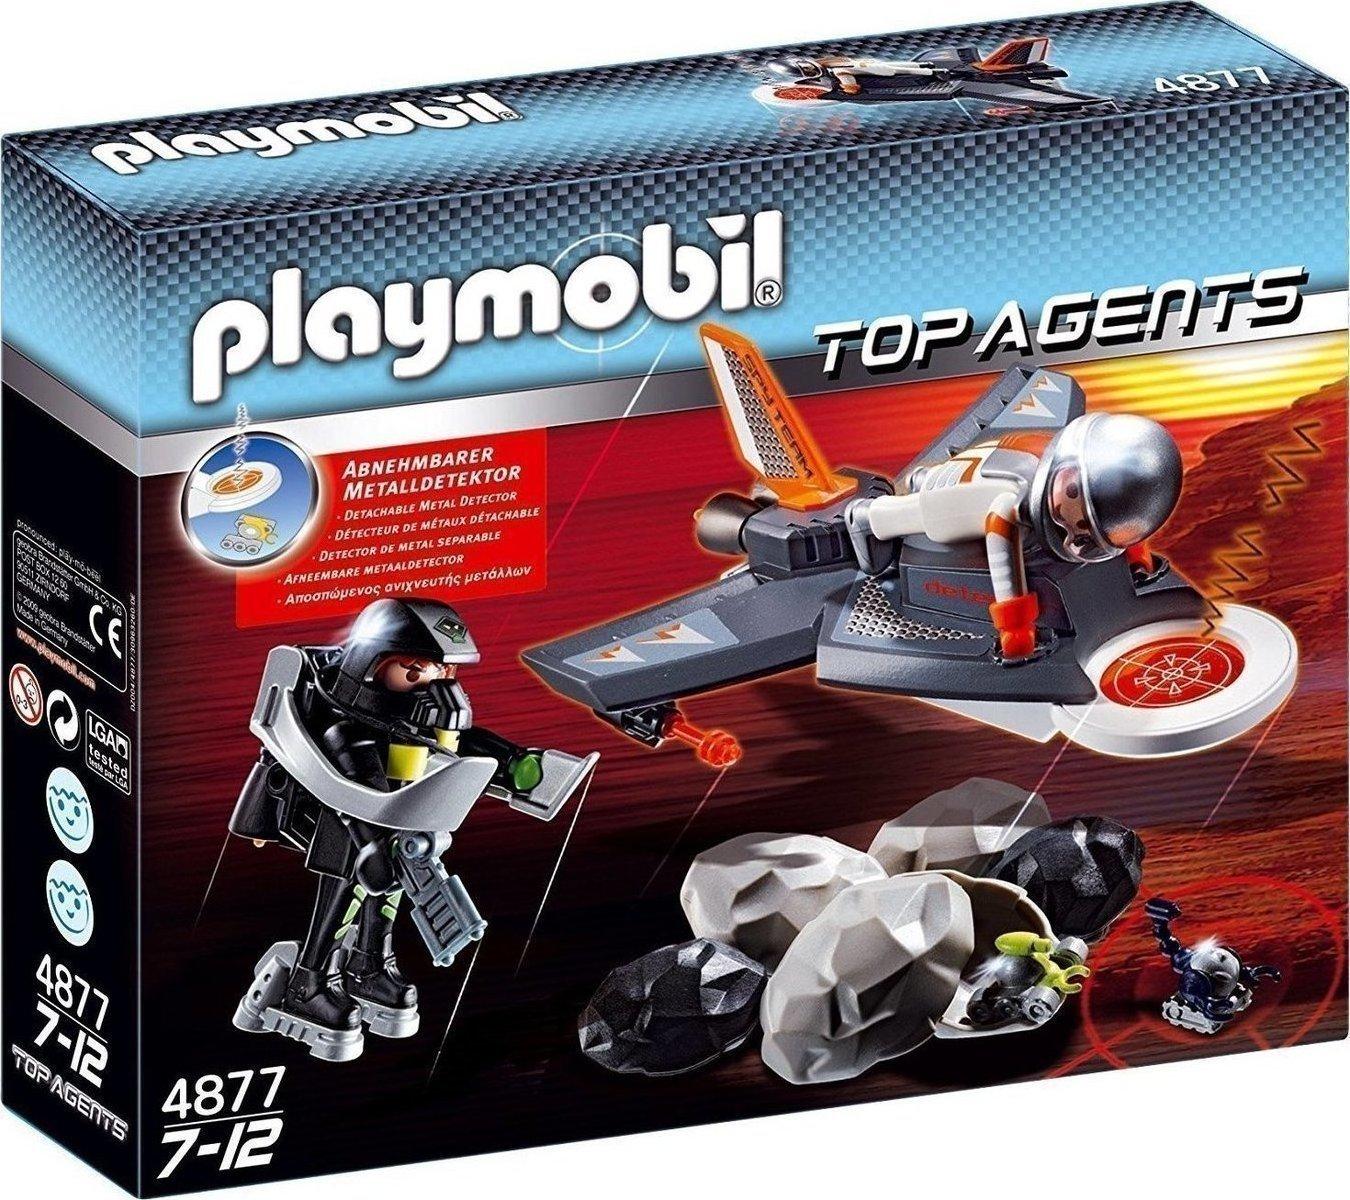 playmobil Αναγνωριστικό jet top agents 4877  skroutzgr